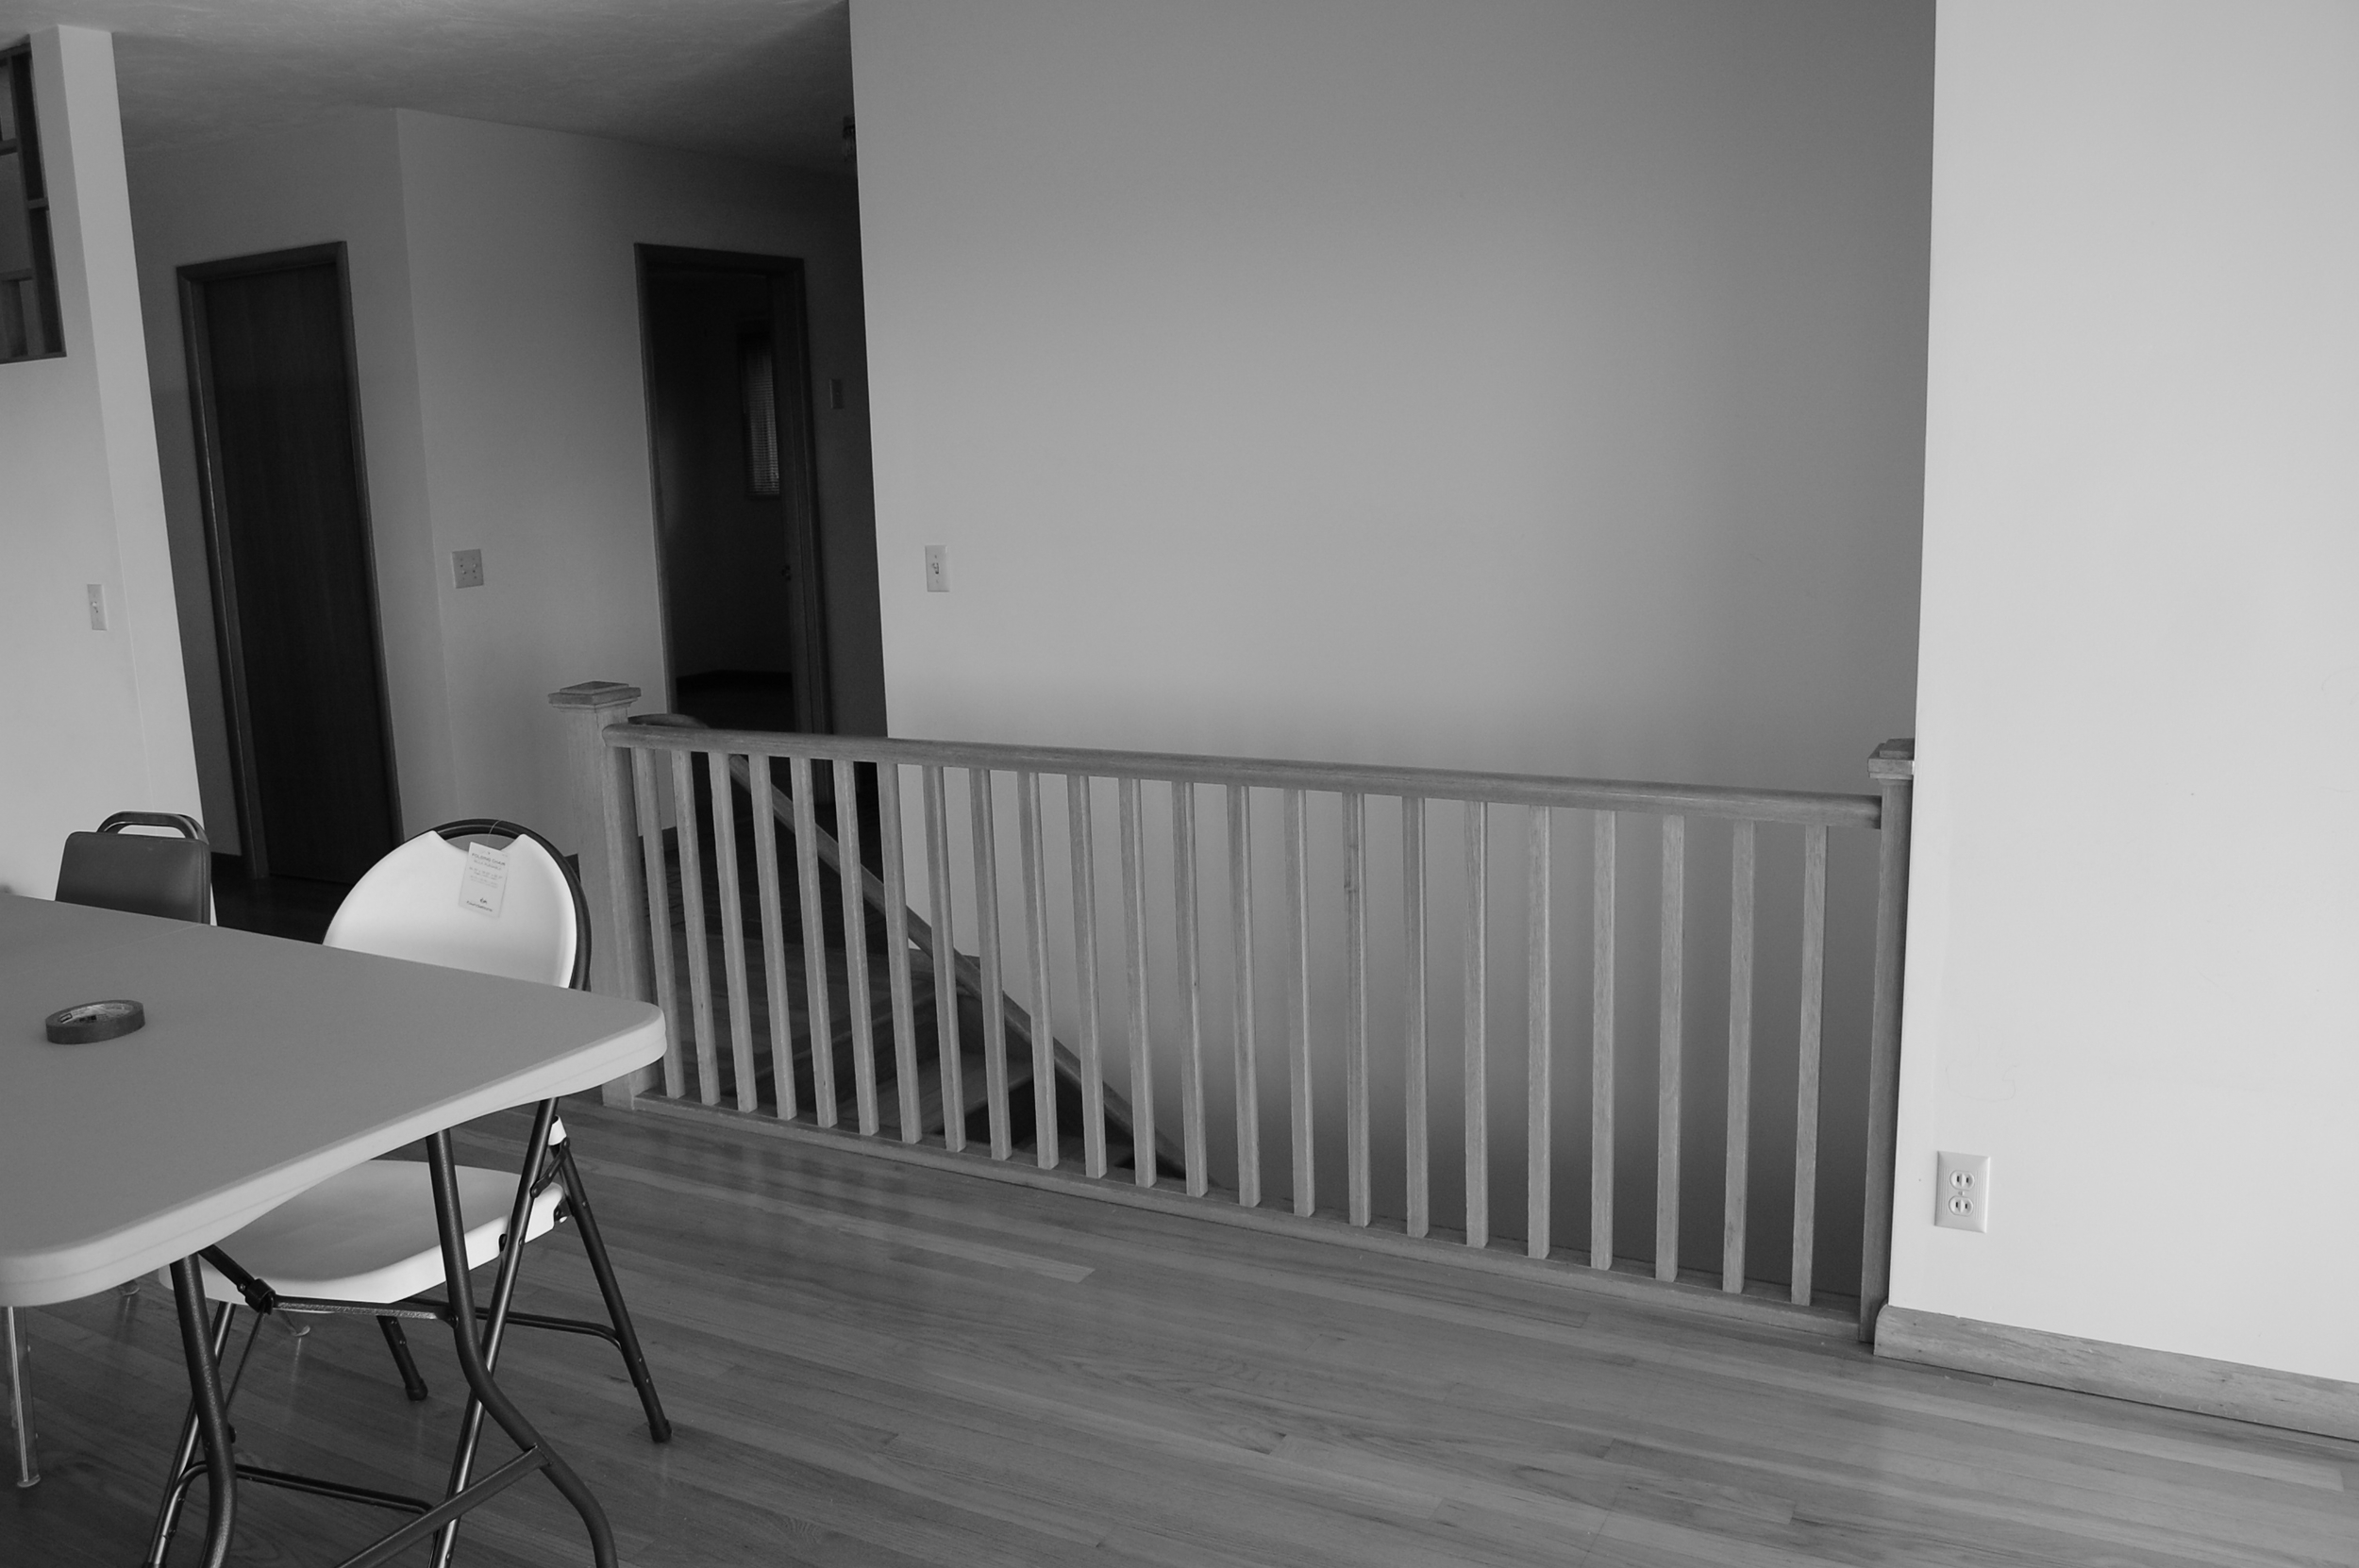 guardrail - before